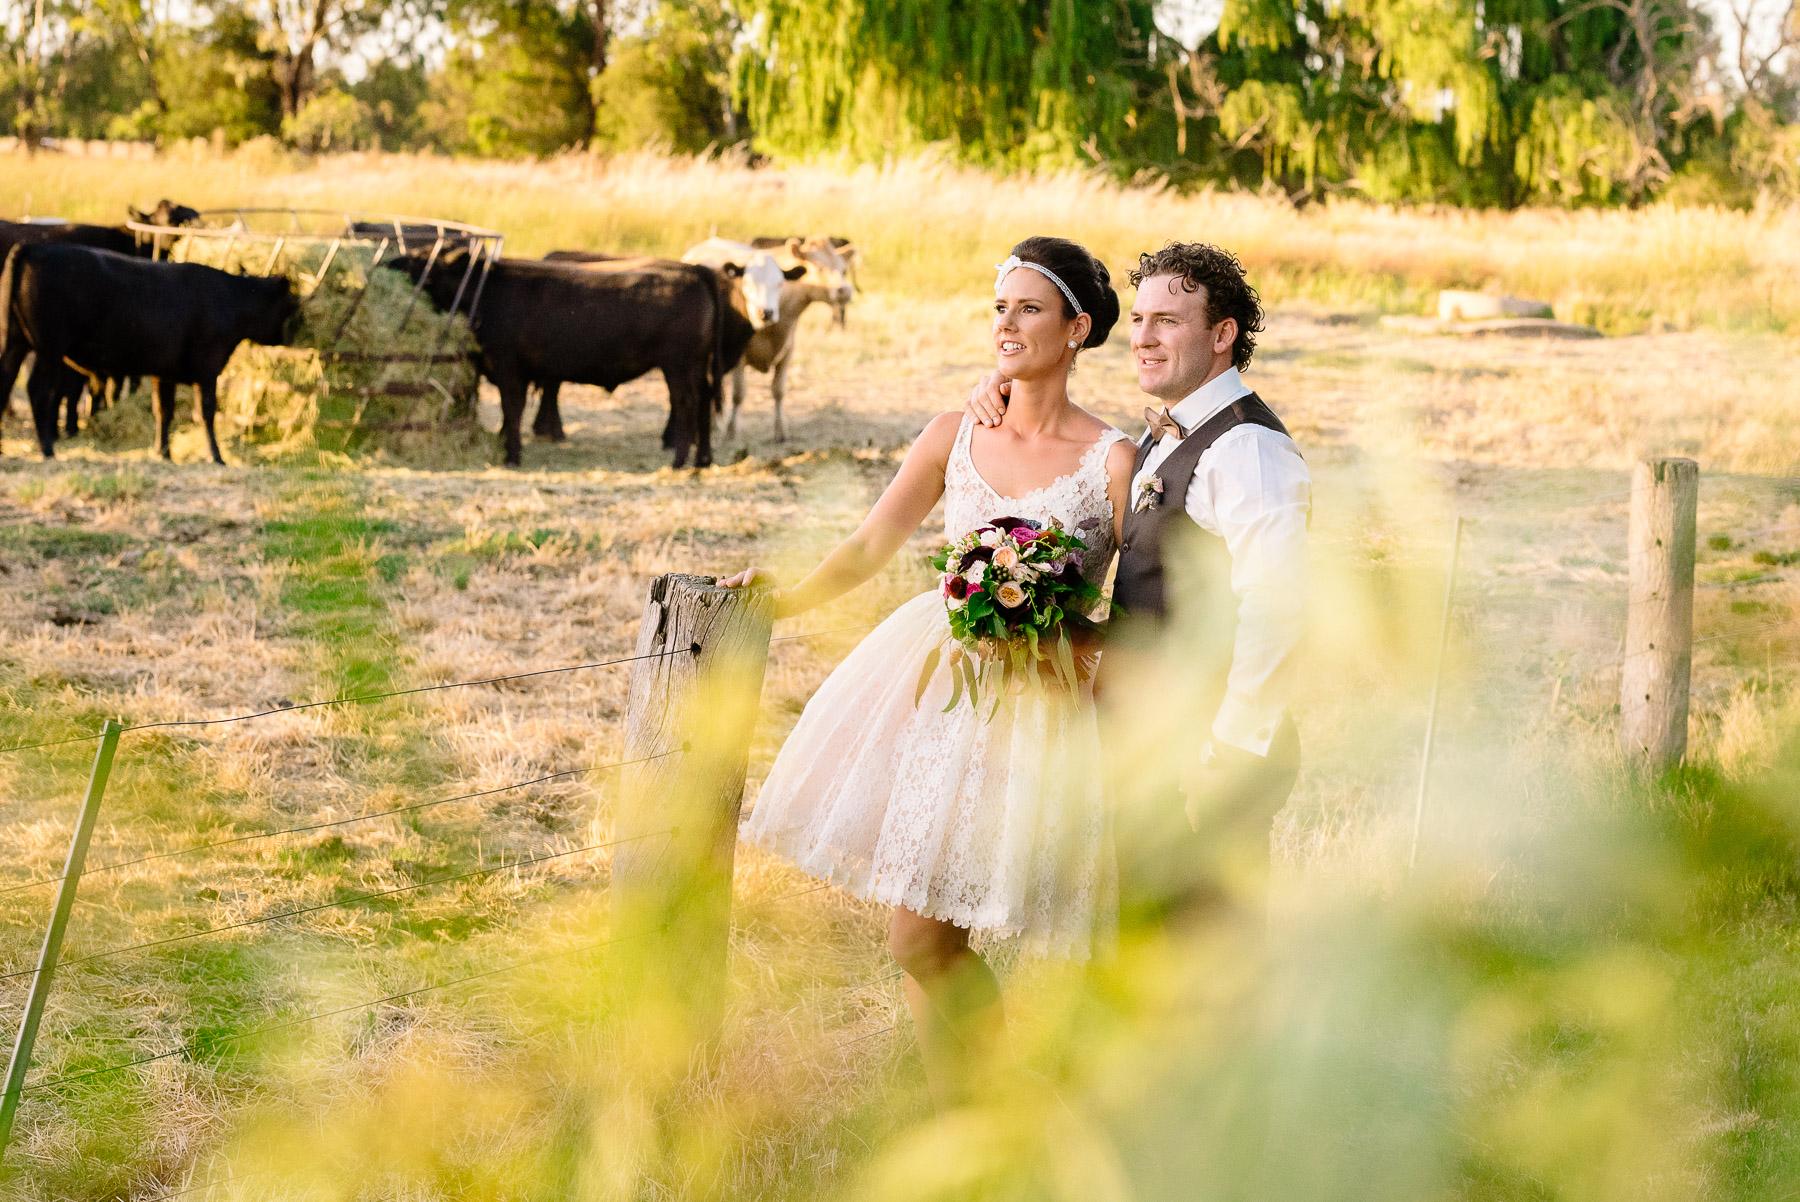 Melissa_and_Kristan_Echuca_Farm_Wedding_New_Years_Eve-100.jpg